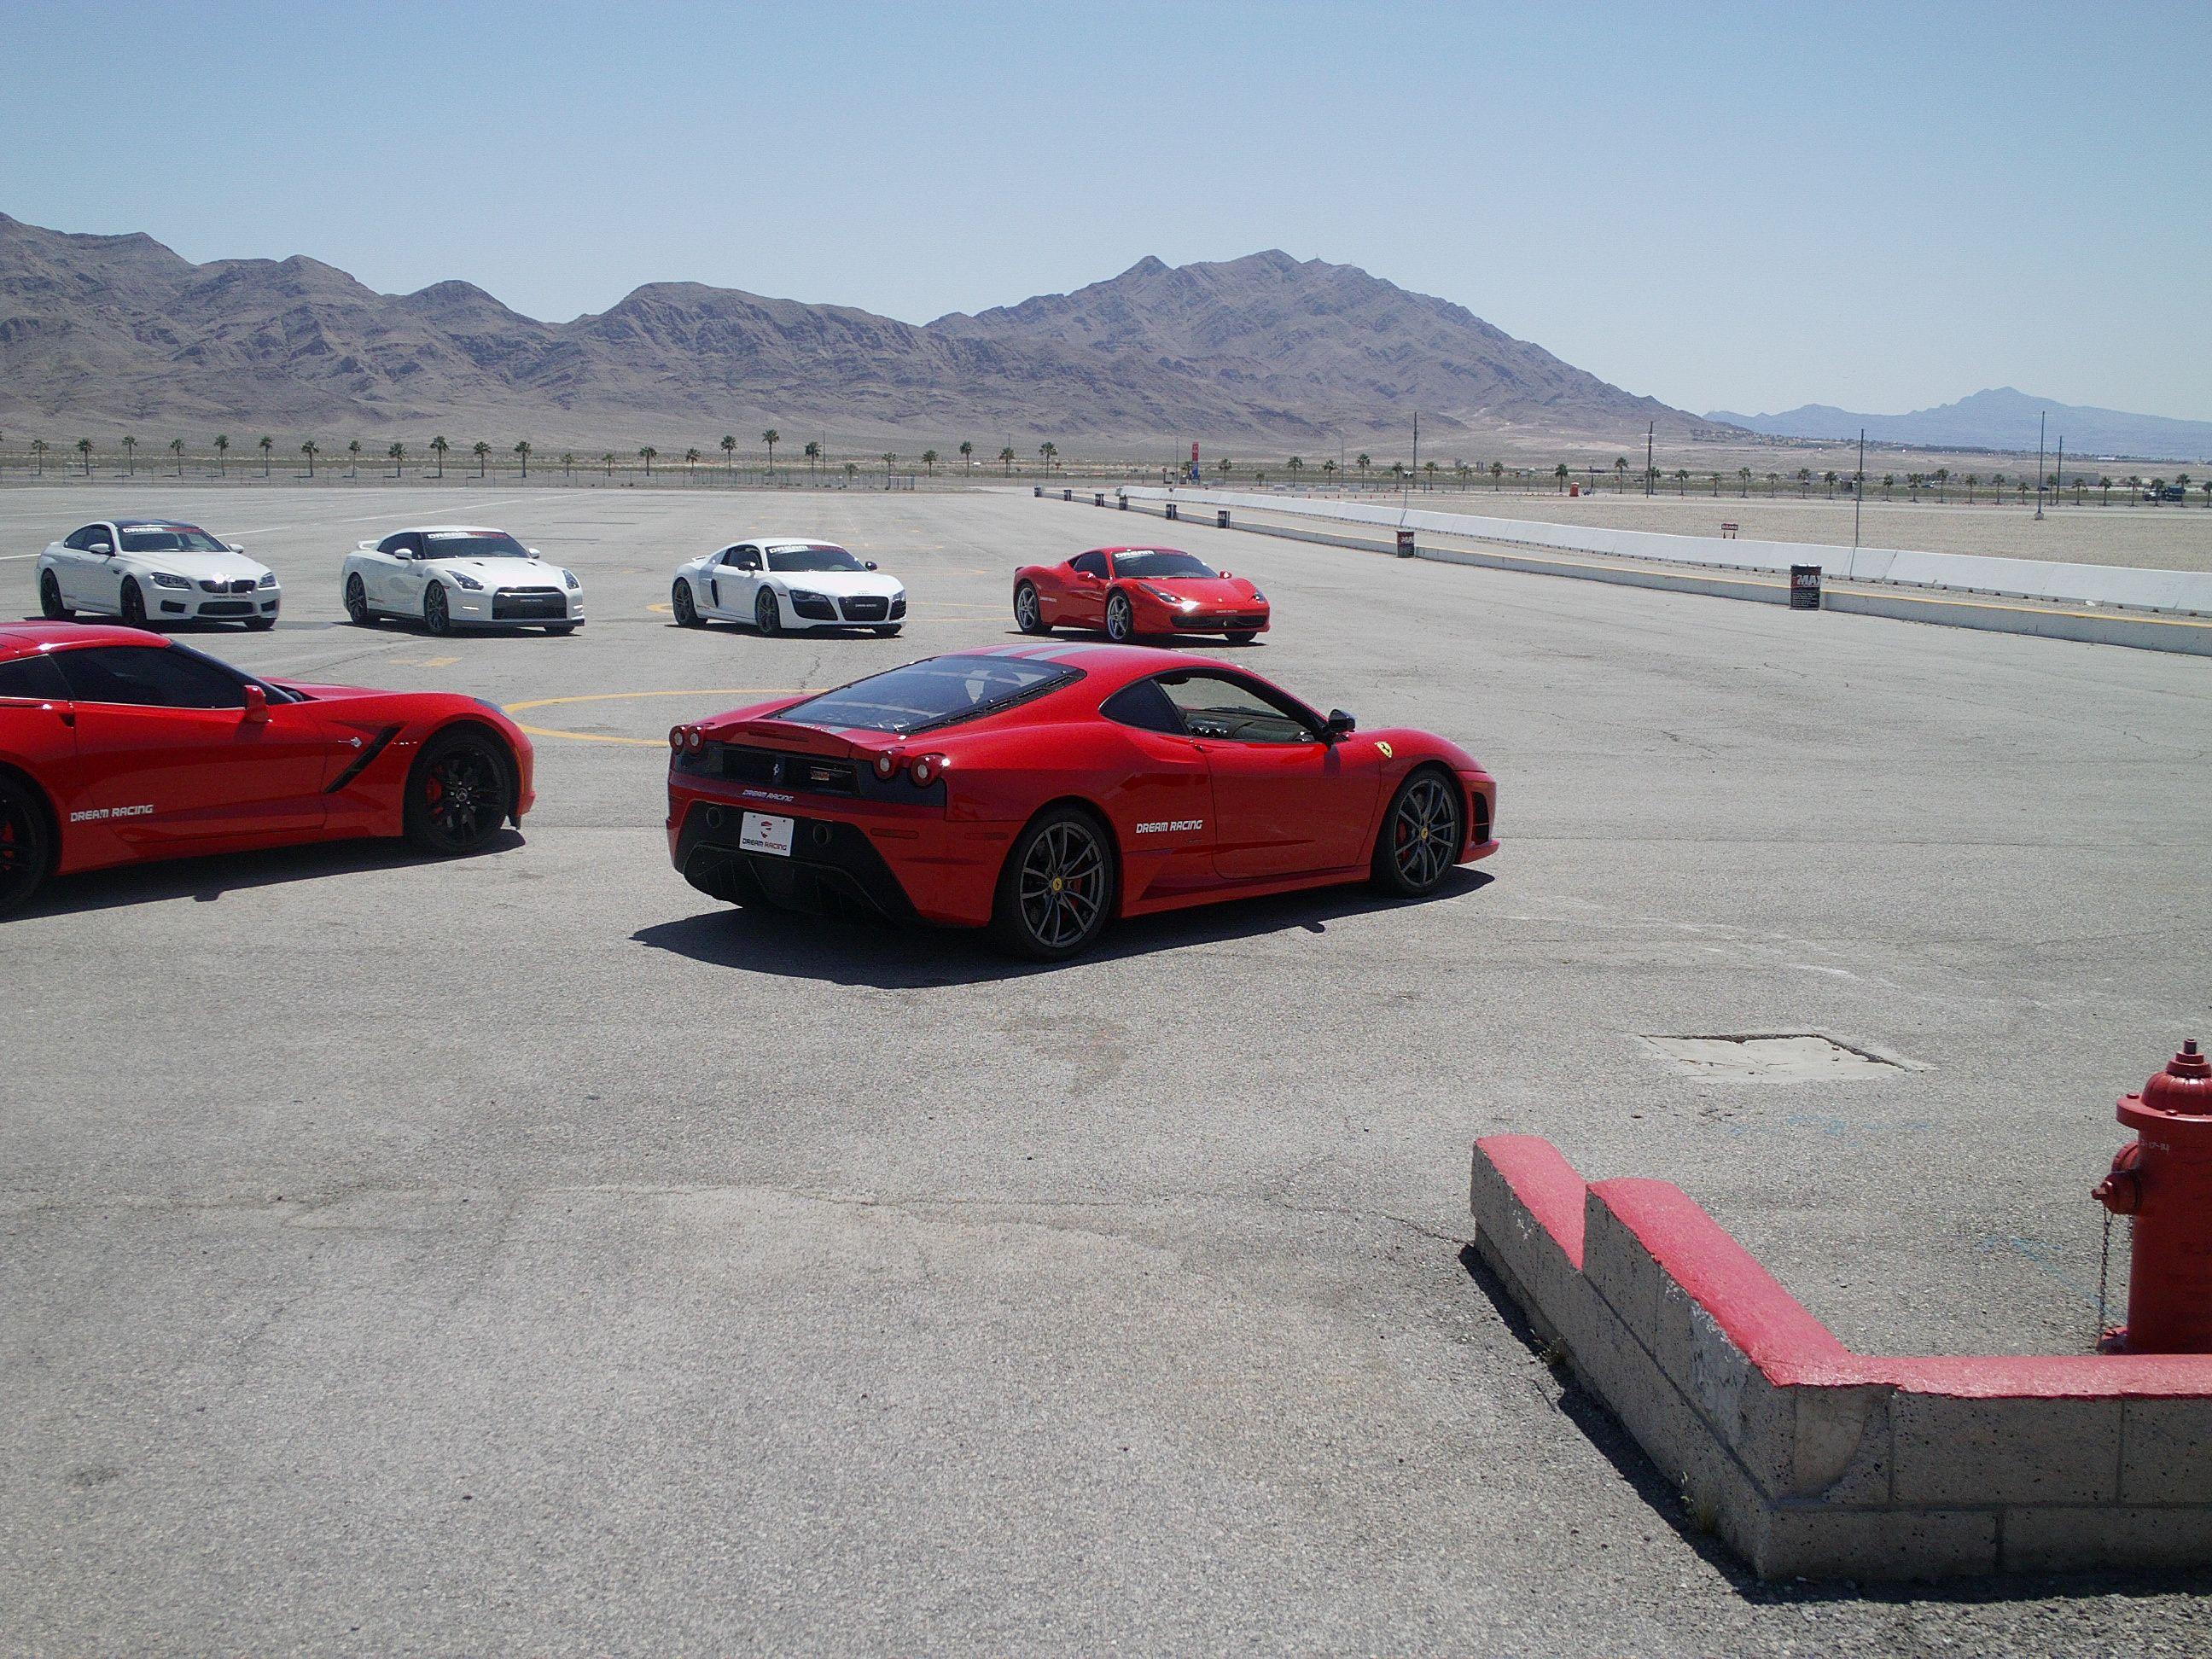 Exotic car experience at Las Vegas Speedway